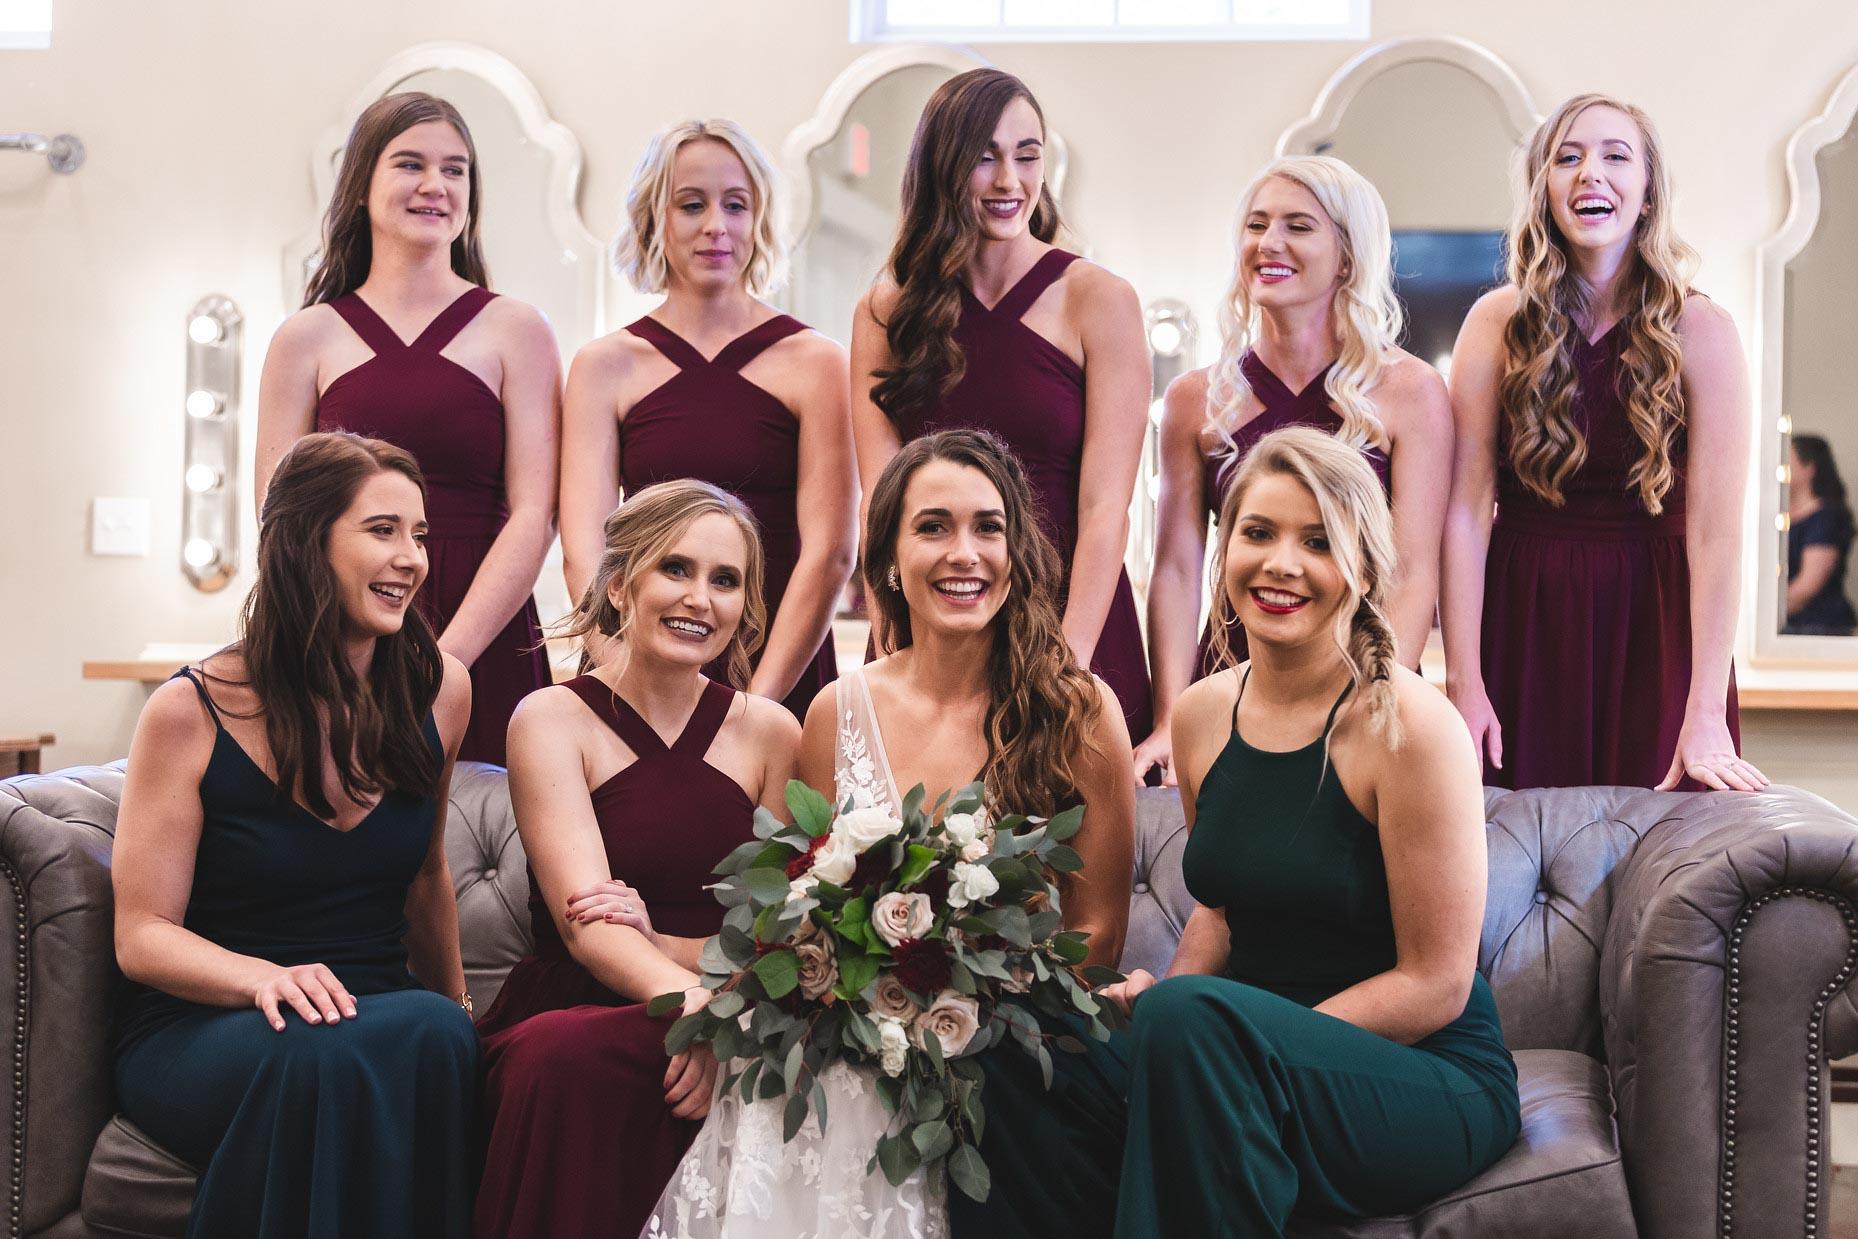 adam-szarmack-bowing-oaks-wedding-photographer-jacksonville-45.jpg